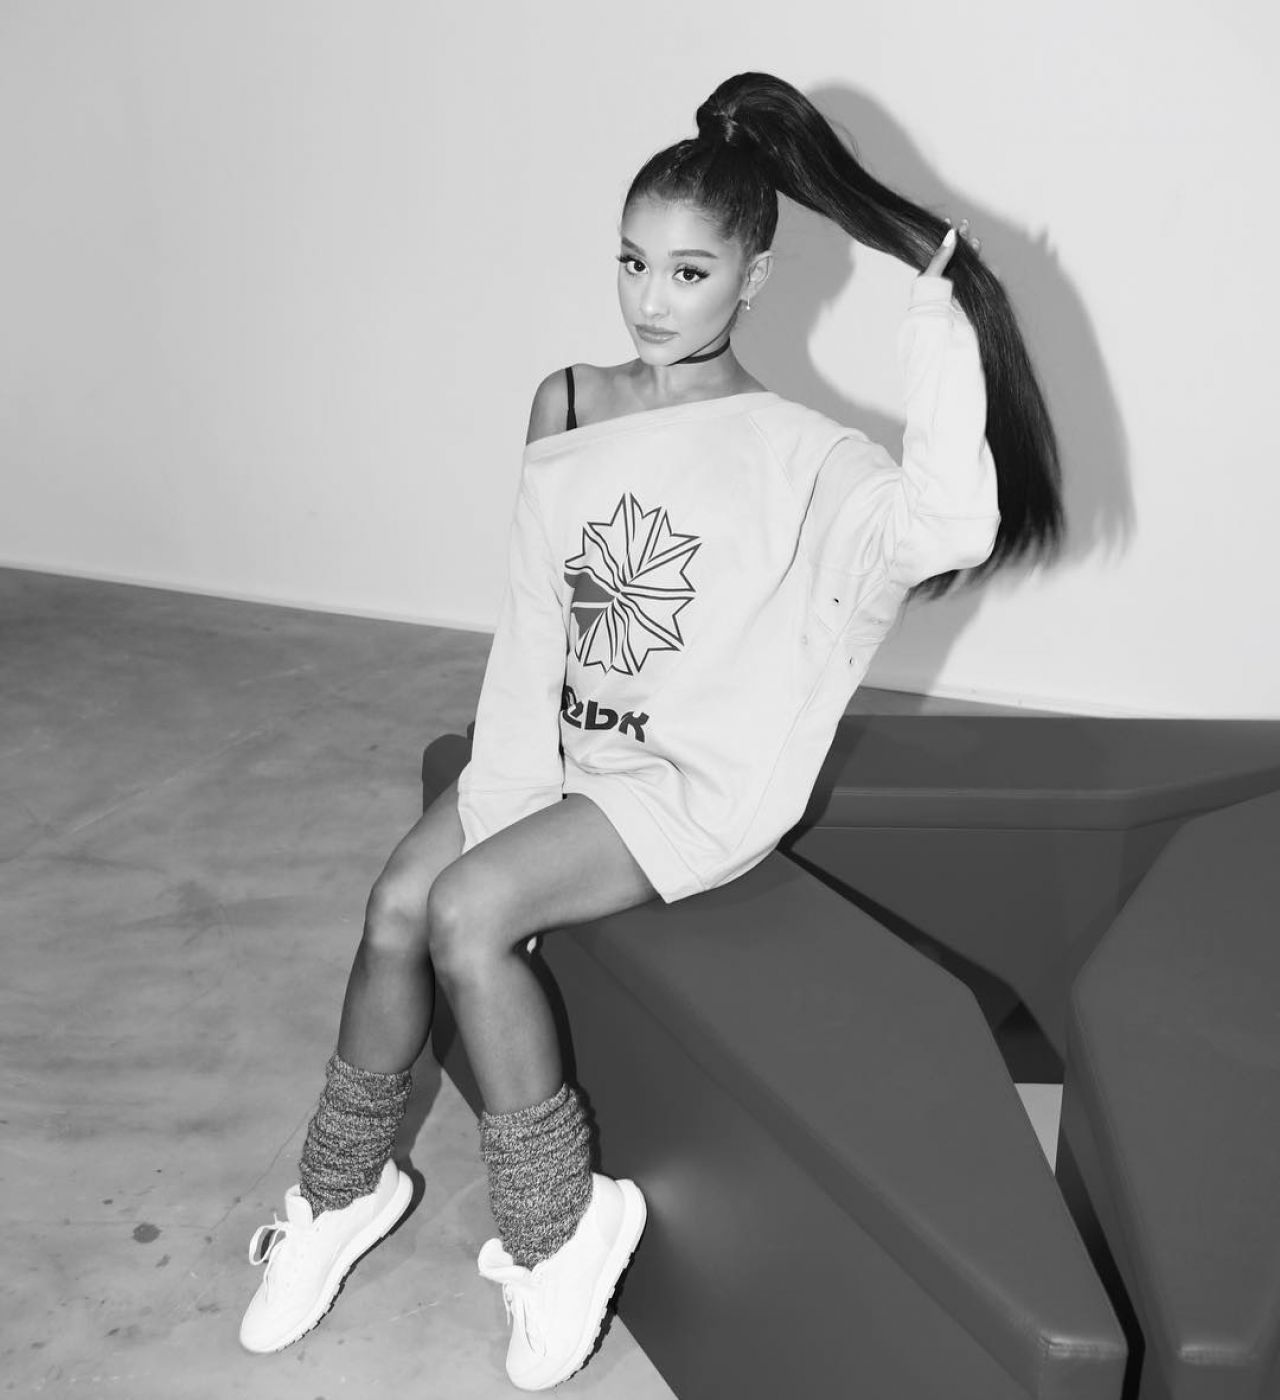 Ariana grande social media pics